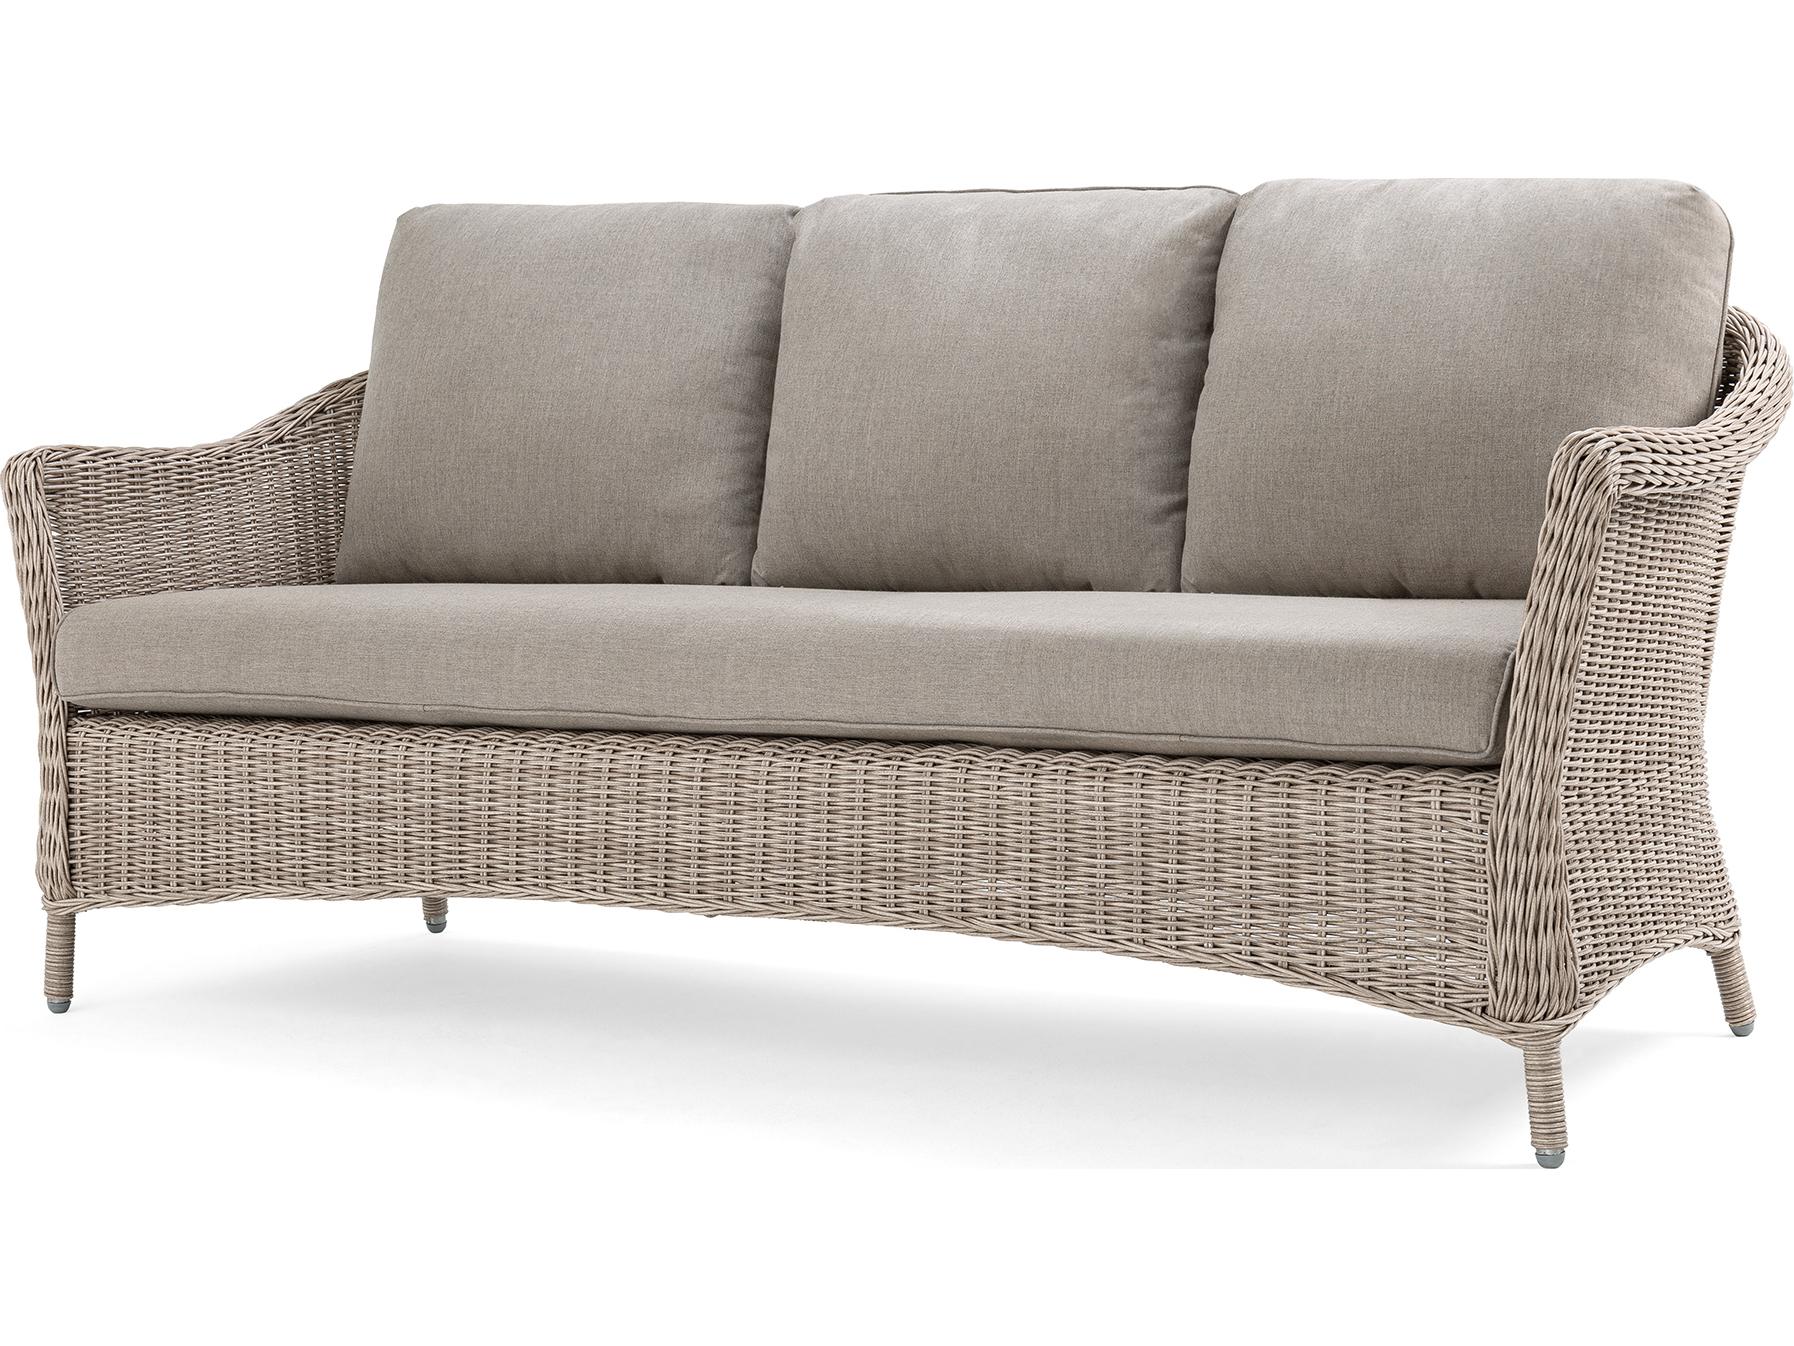 La Z Boy Quick Ship Laurel Cushion Gray Wicker Sofa In Within 2019 Laurel Gray Sofas (View 4 of 20)